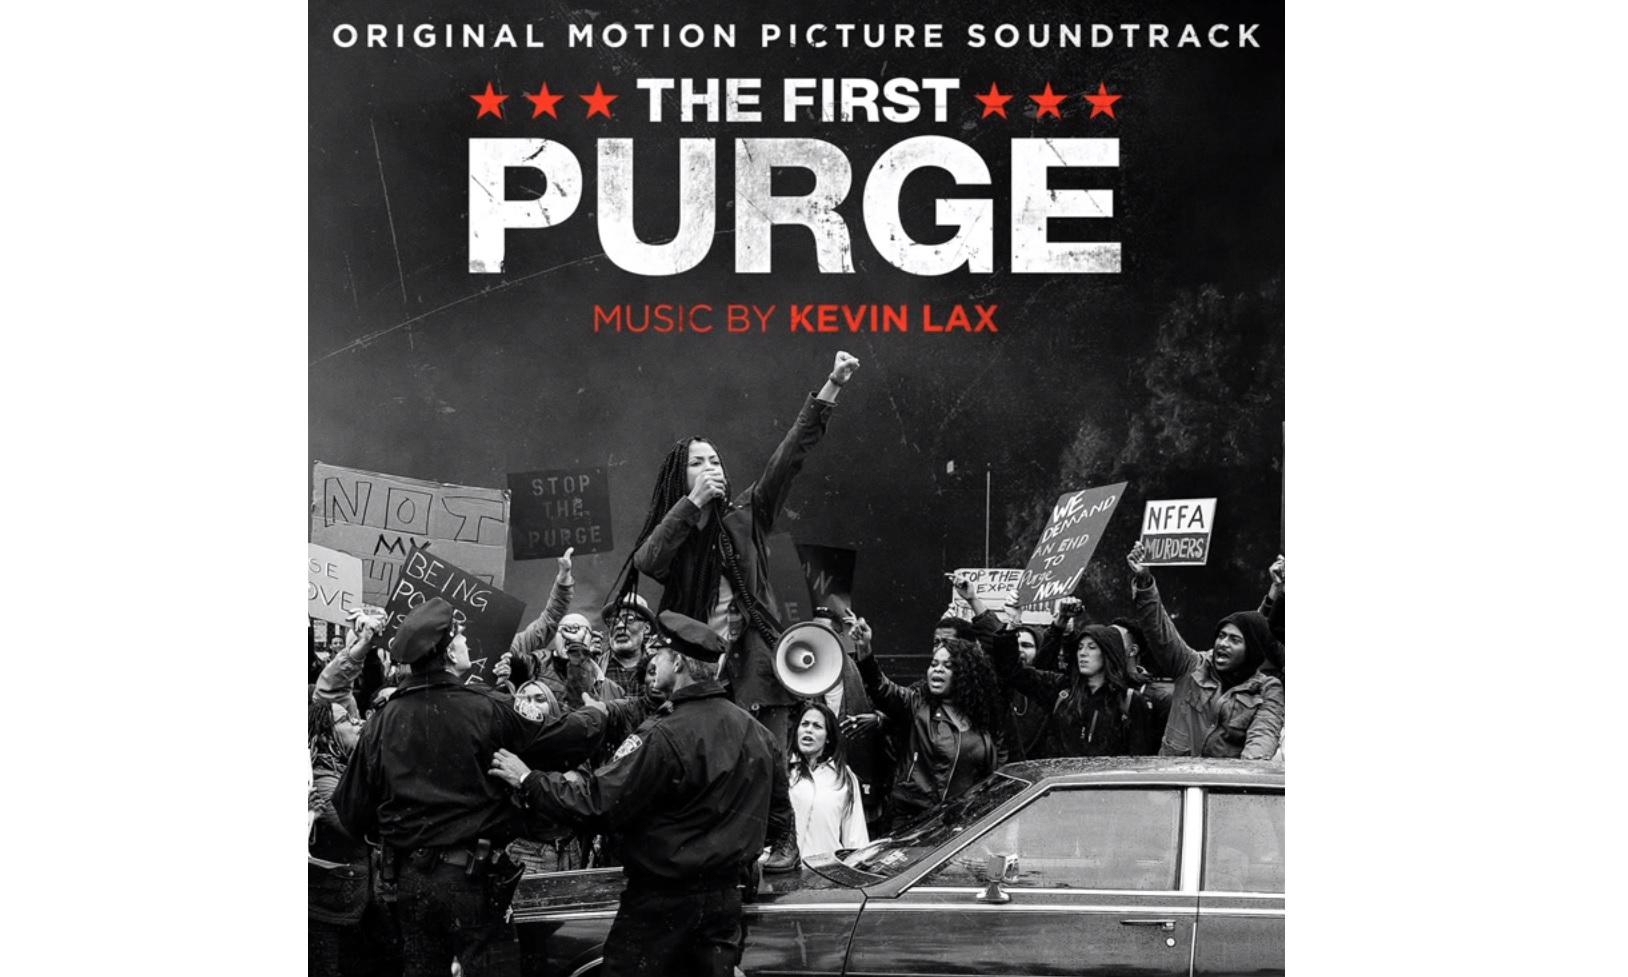 12 Horas Para Sobrevivir El Inicio The First Purge Soundtrack Tráiler Dosis Media